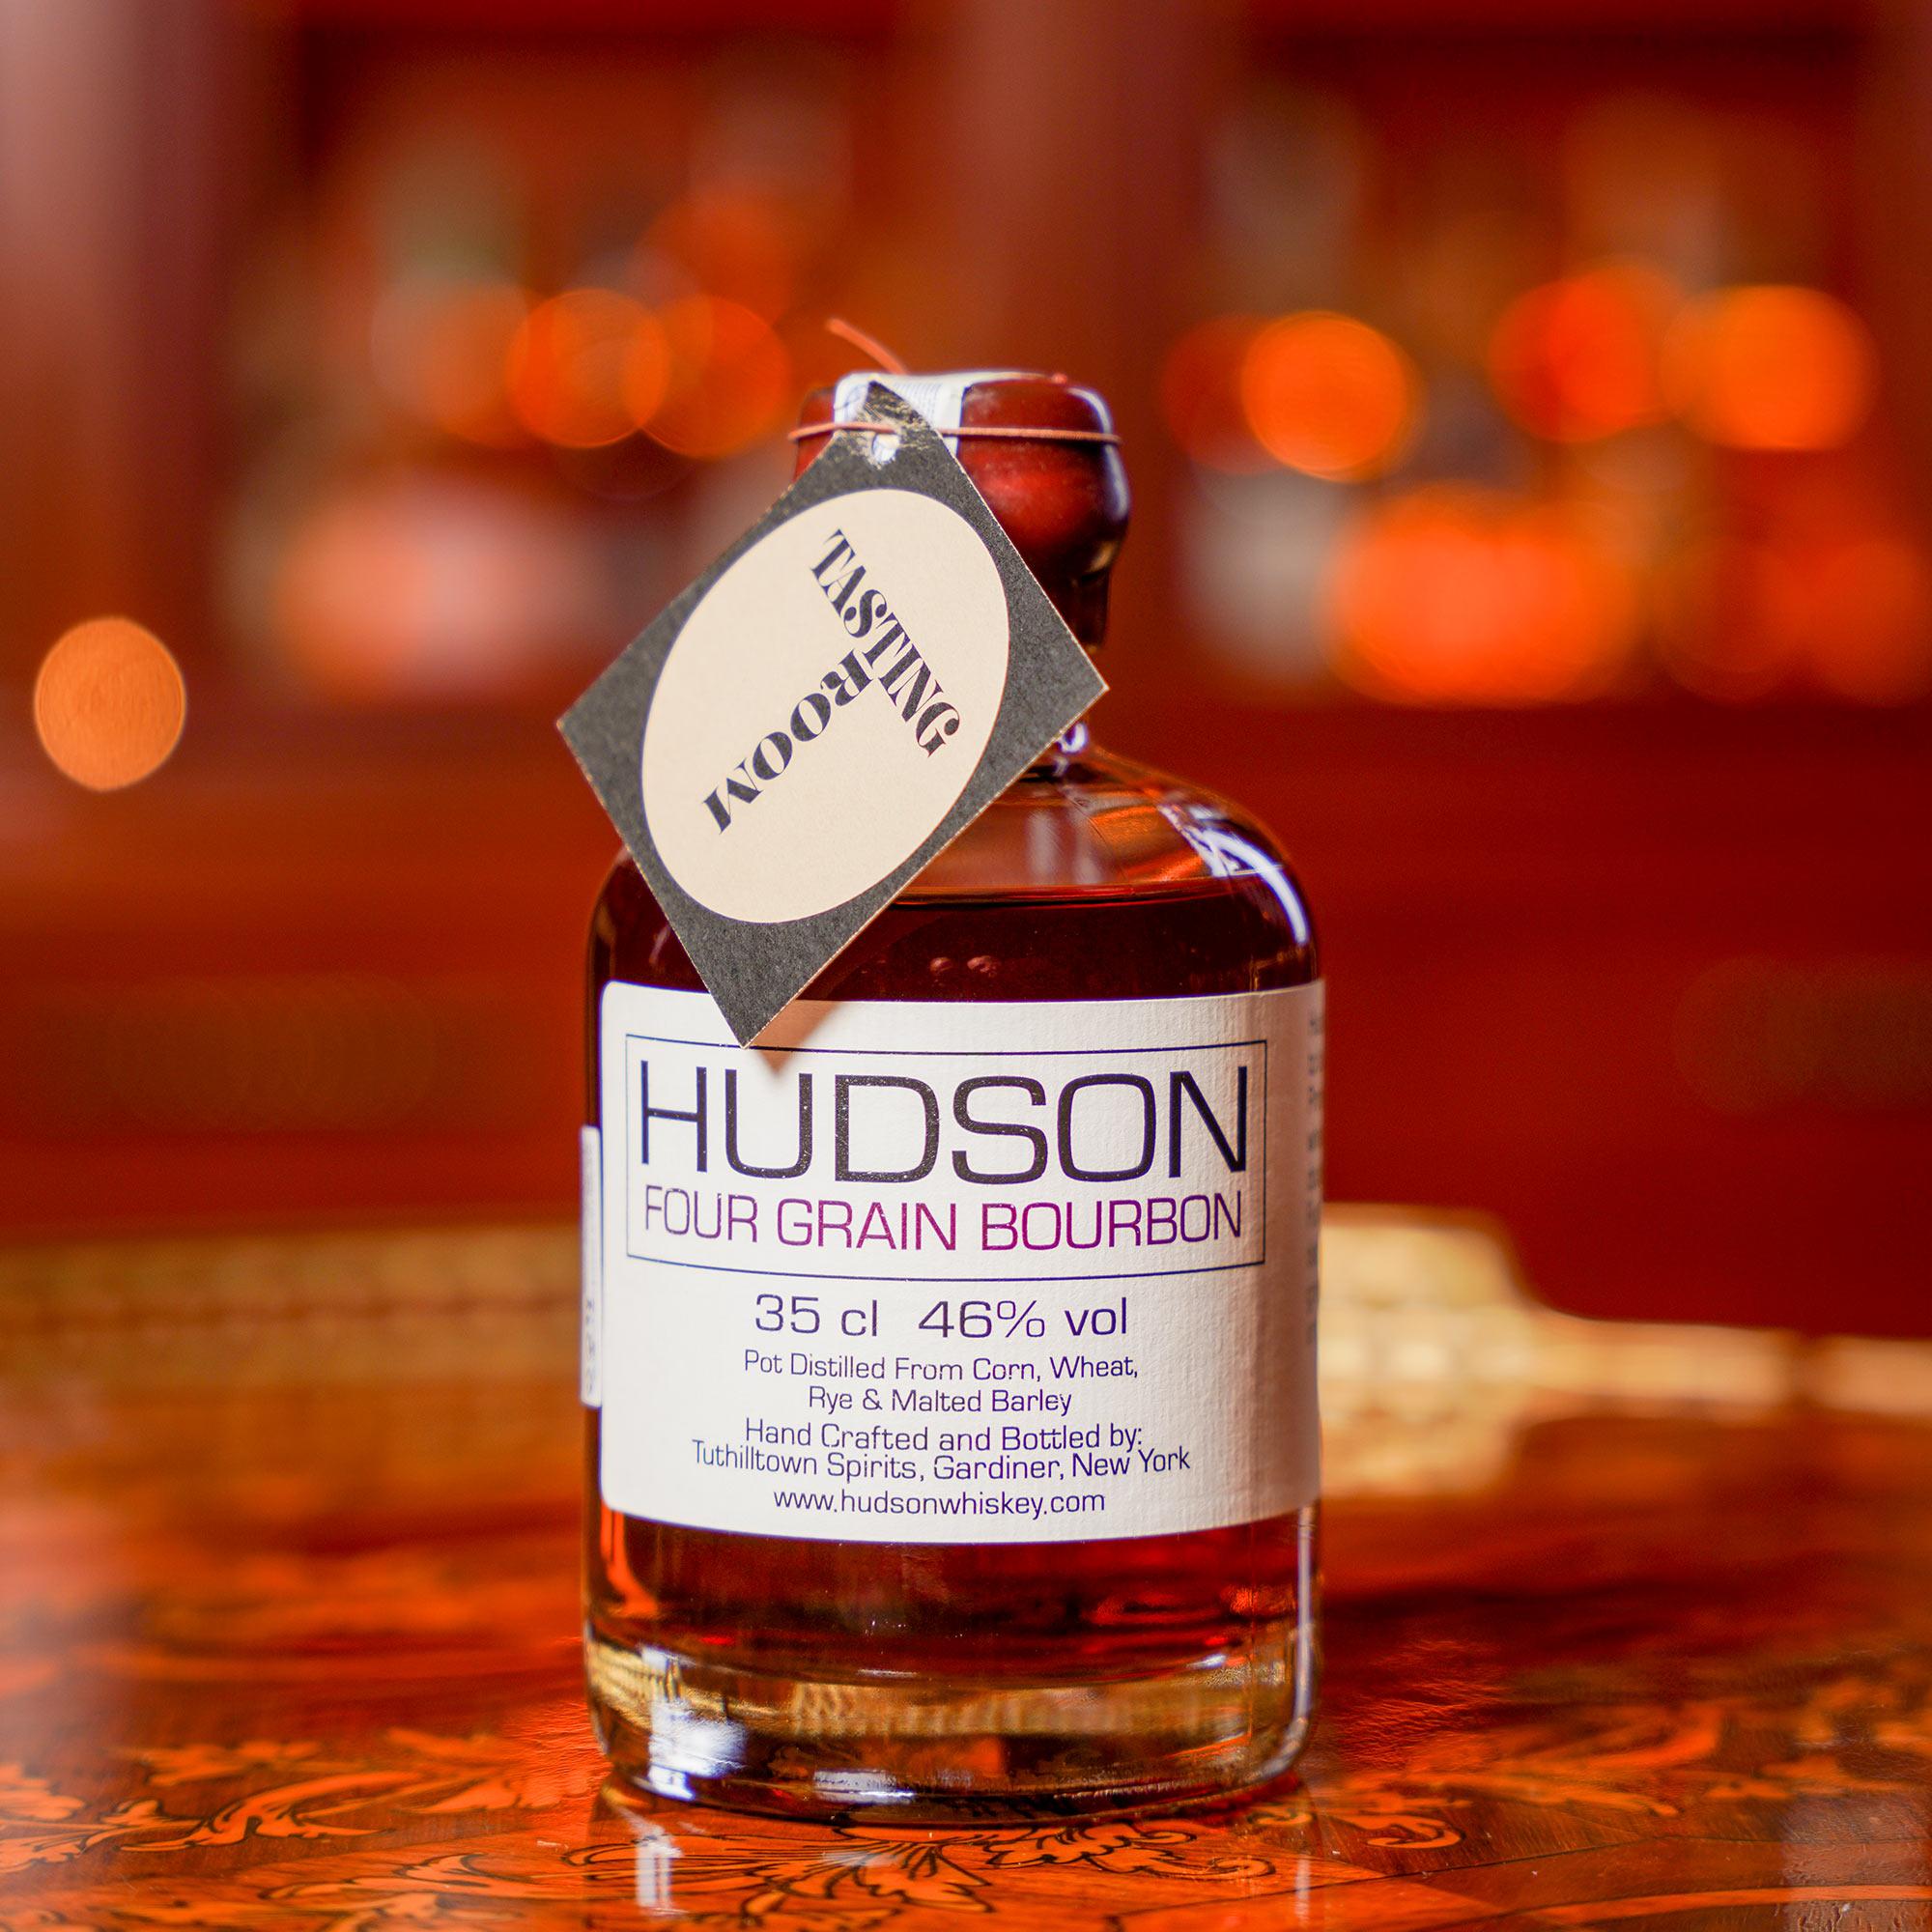 Hudson Four Grain Bourbon /Хъдсън Фоур Грейн Бърбън